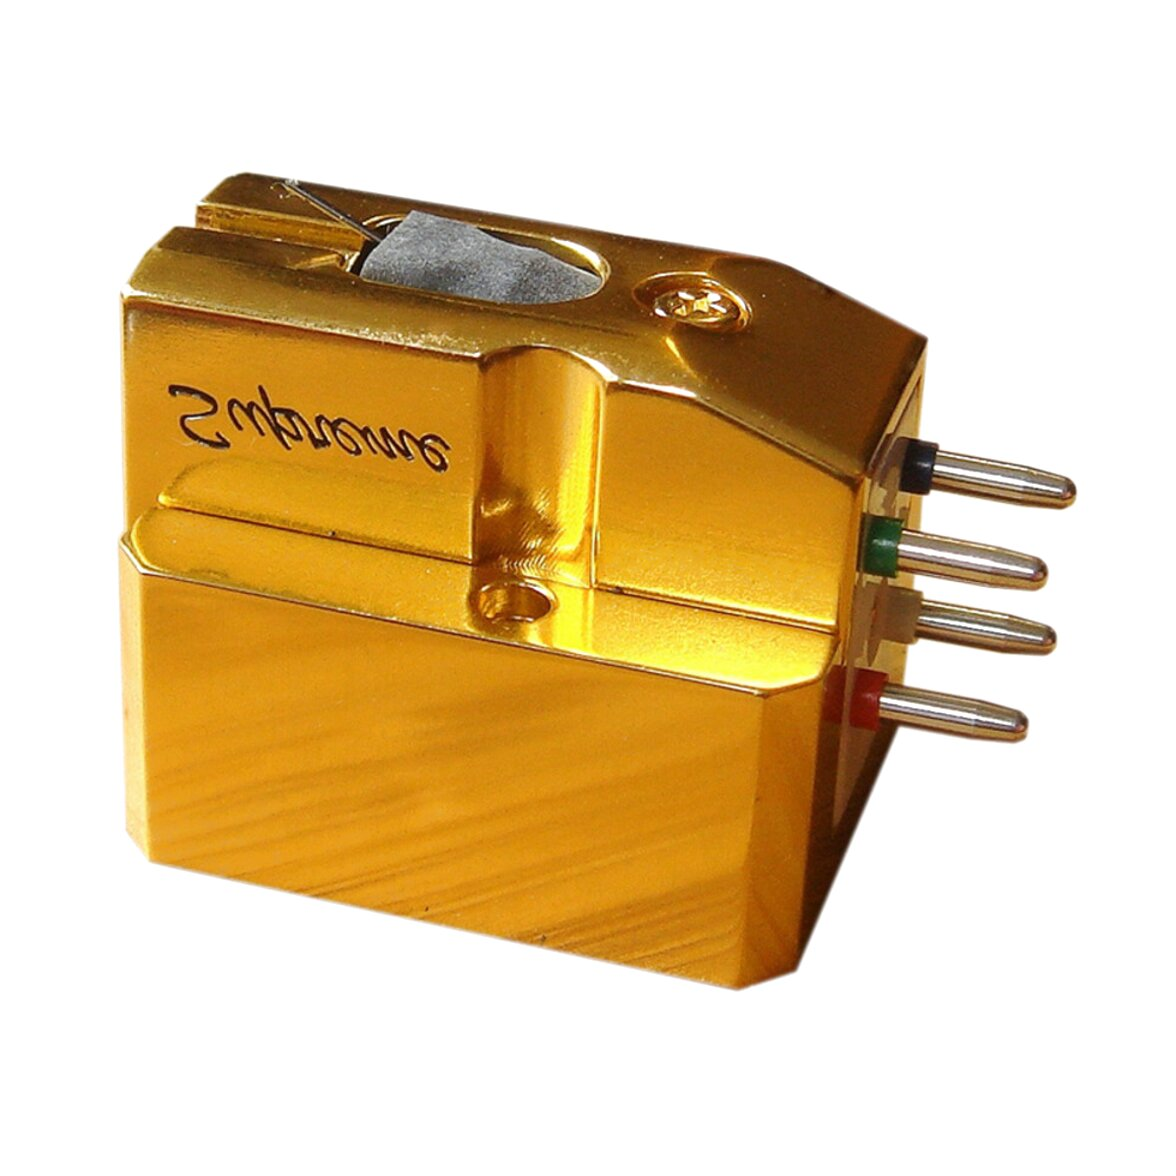 phono cartridge for sale